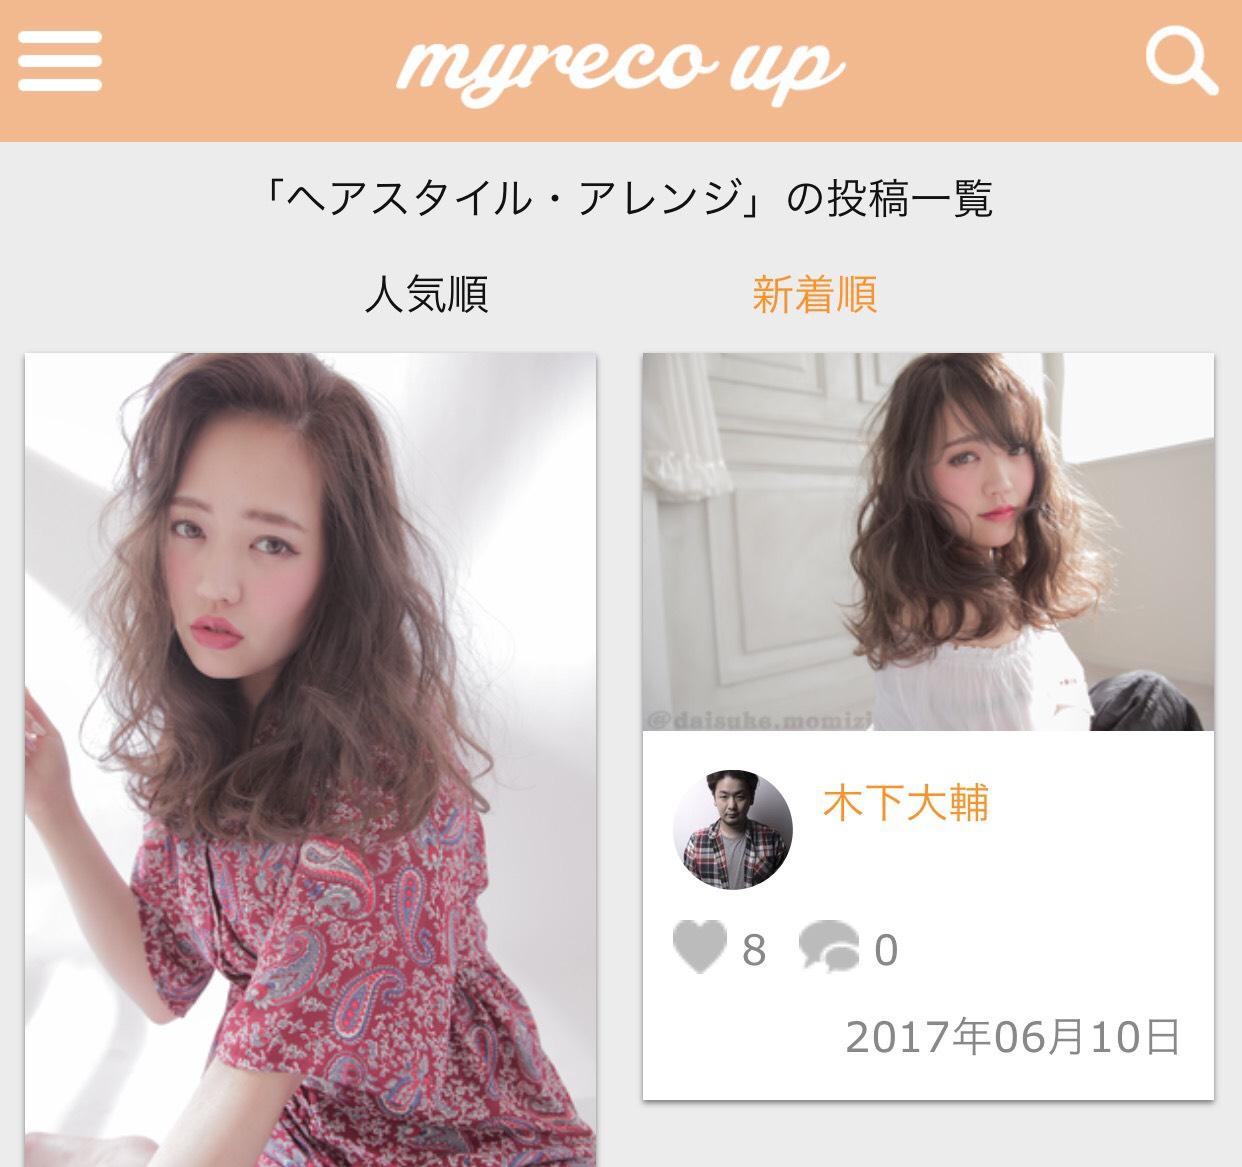 myreco up